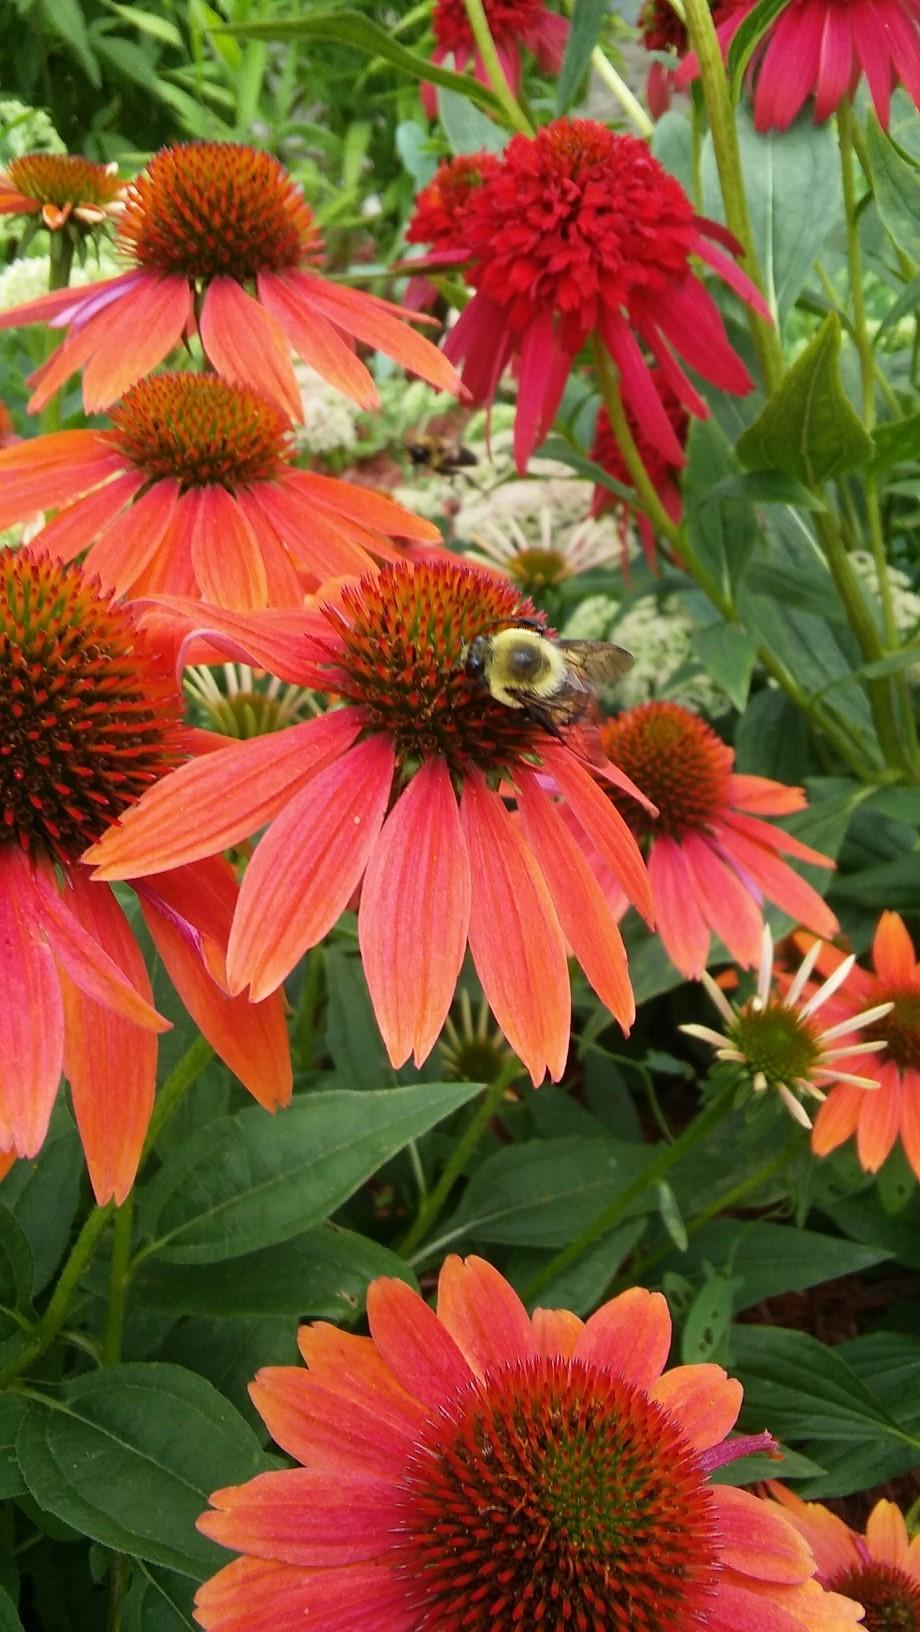 bee on red conflower closeup.jpg